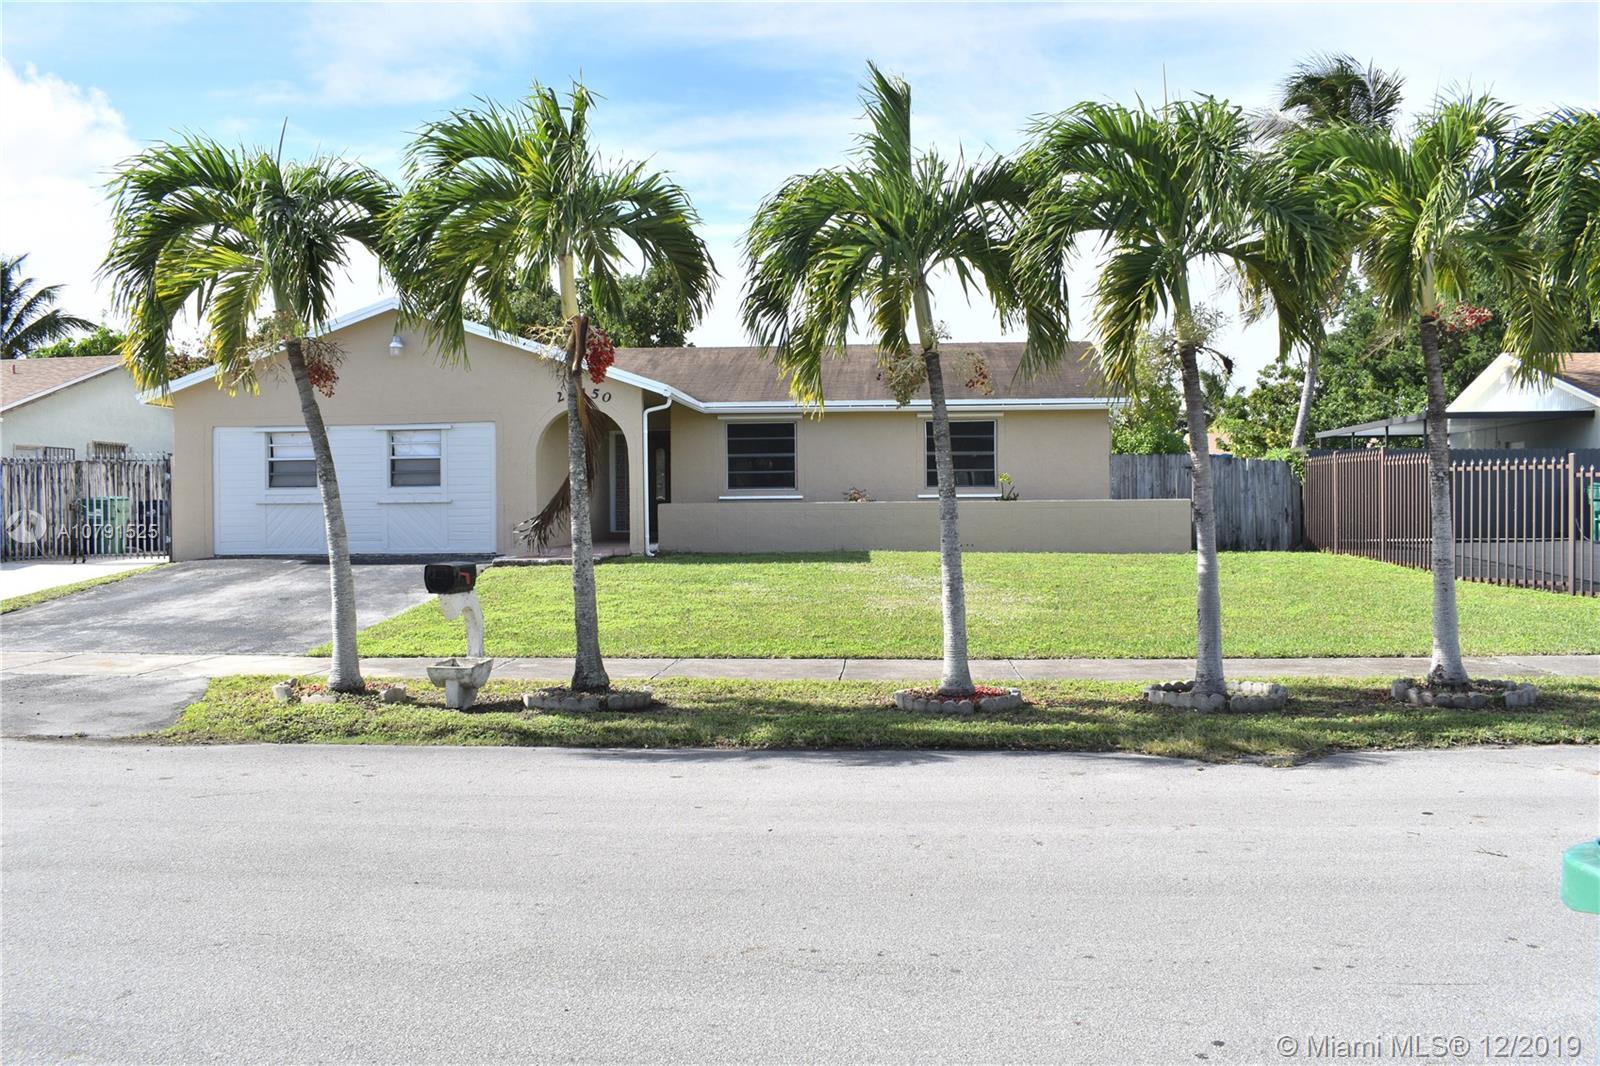 26150 SW 132 pl, Homestead, FL 33032 - Homestead, FL real estate listing